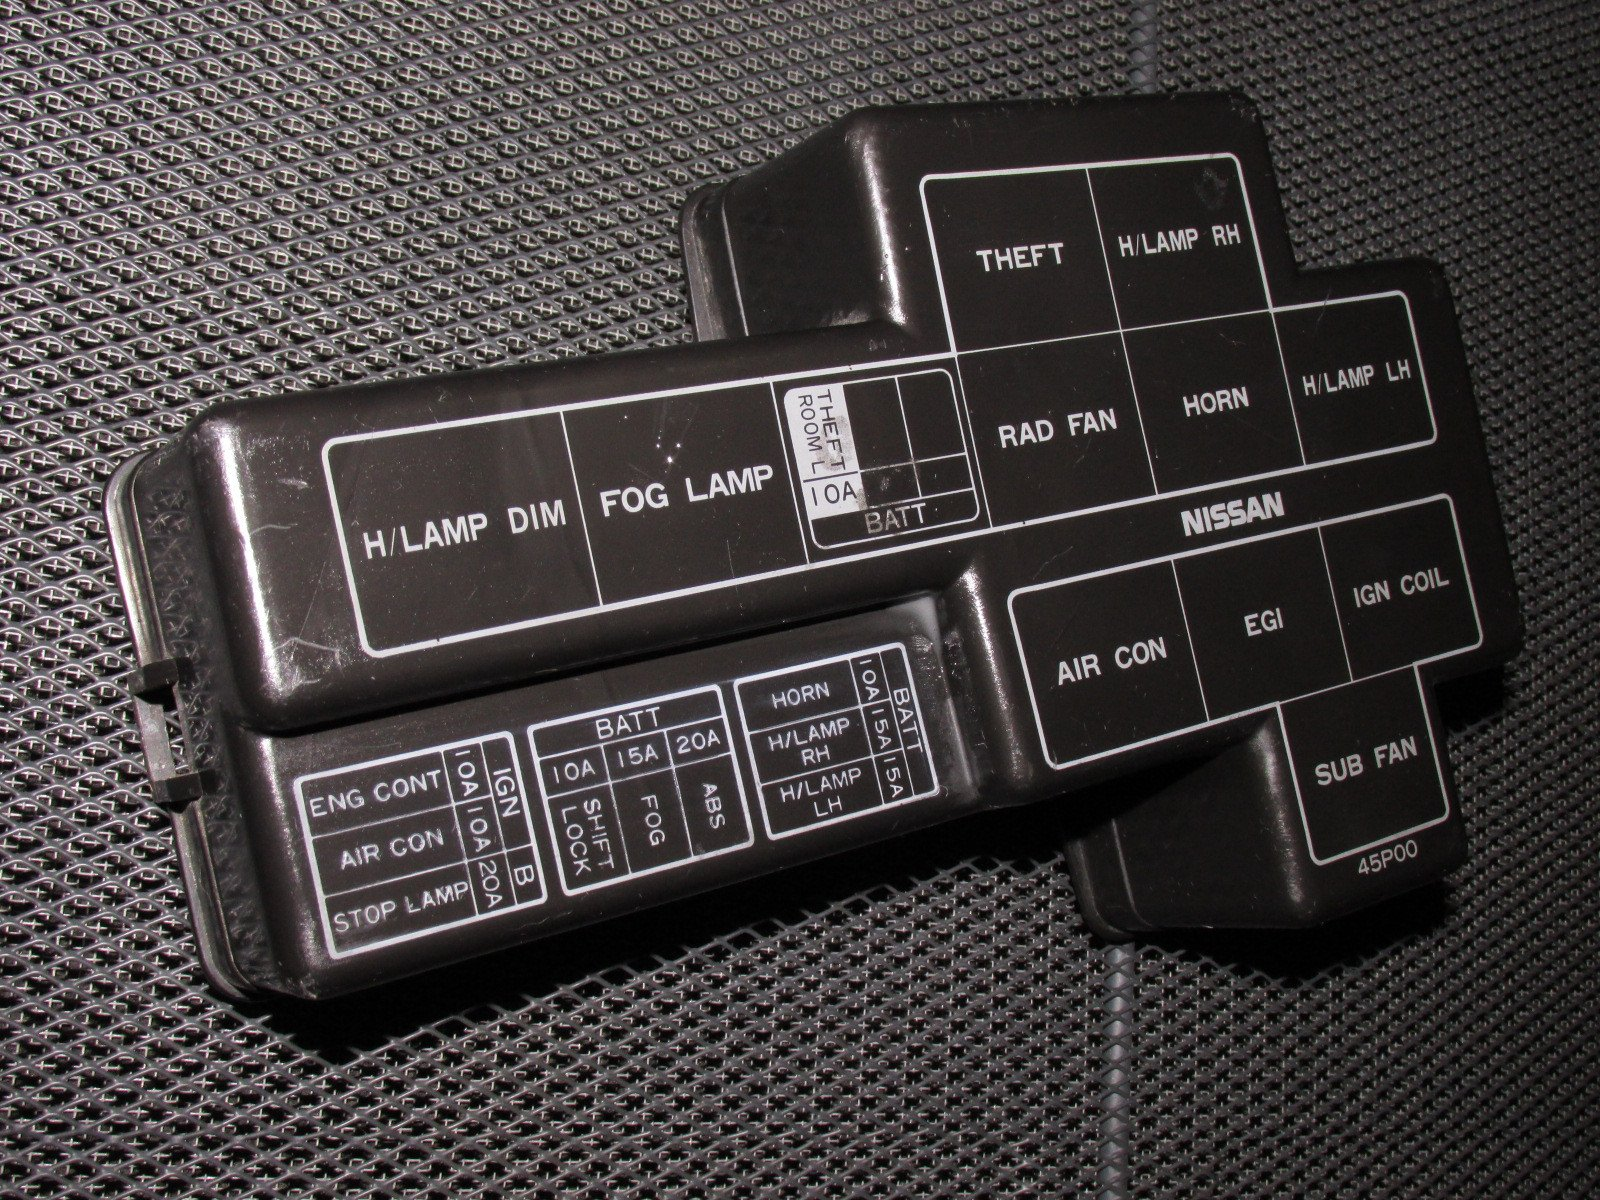 [DIAGRAM_0HG]  BX_8134] 85 Nissan 300Zx Fuse Box Diagram Schematic Wiring | 1993 300zx Location Of Fuse Box |  | Faun Etic Numap Pala Jebrp Dext Wigeg Mohammedshrine Librar Wiring 101